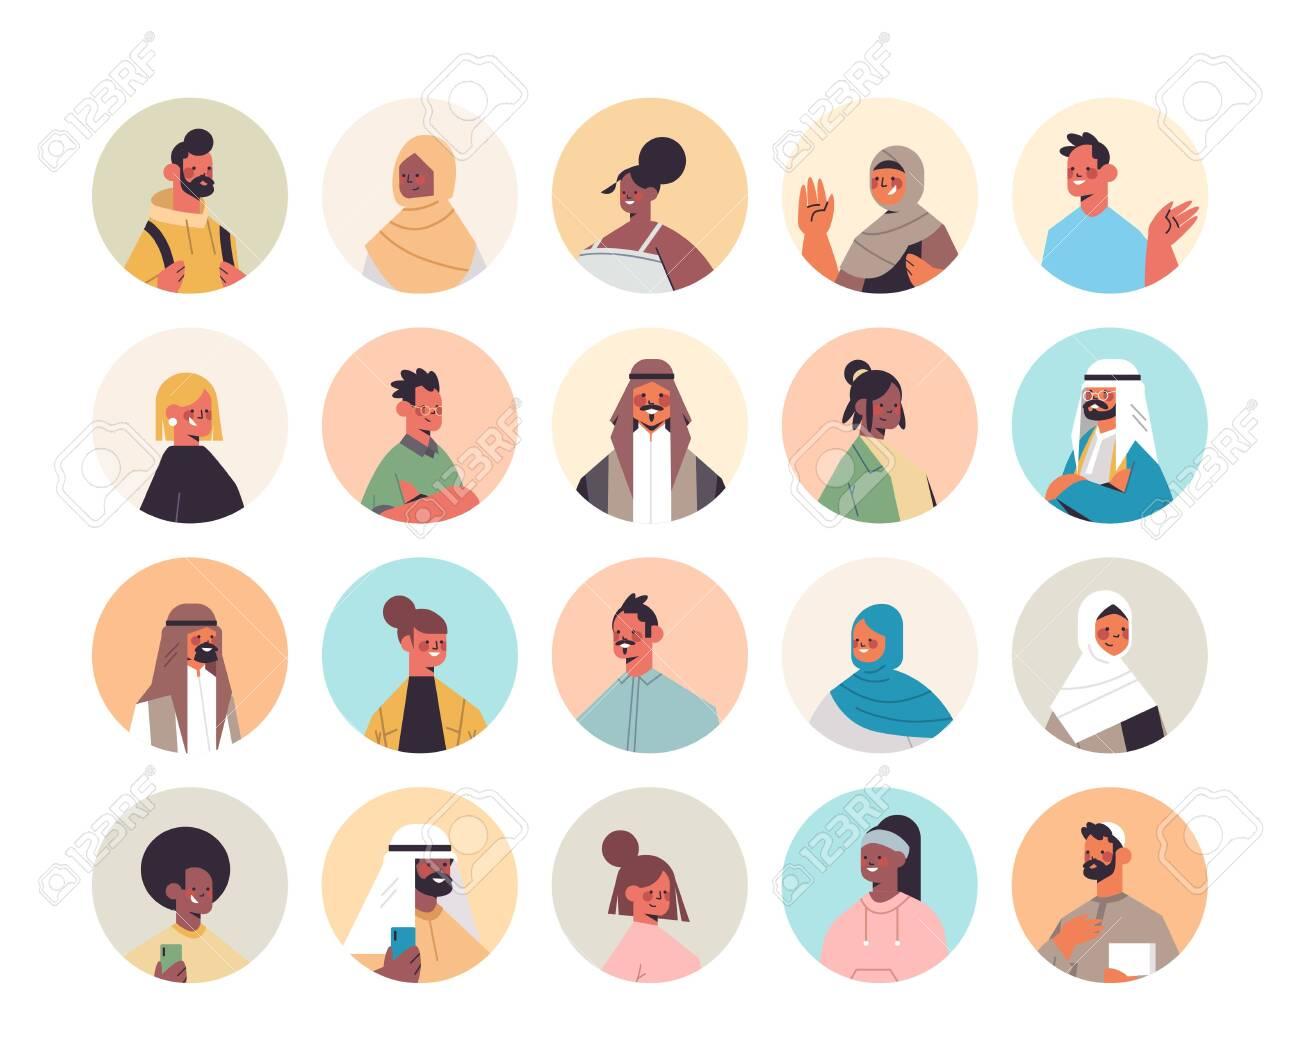 set mix race people avatars men women portraits collection male female cartoon characters - 152391906